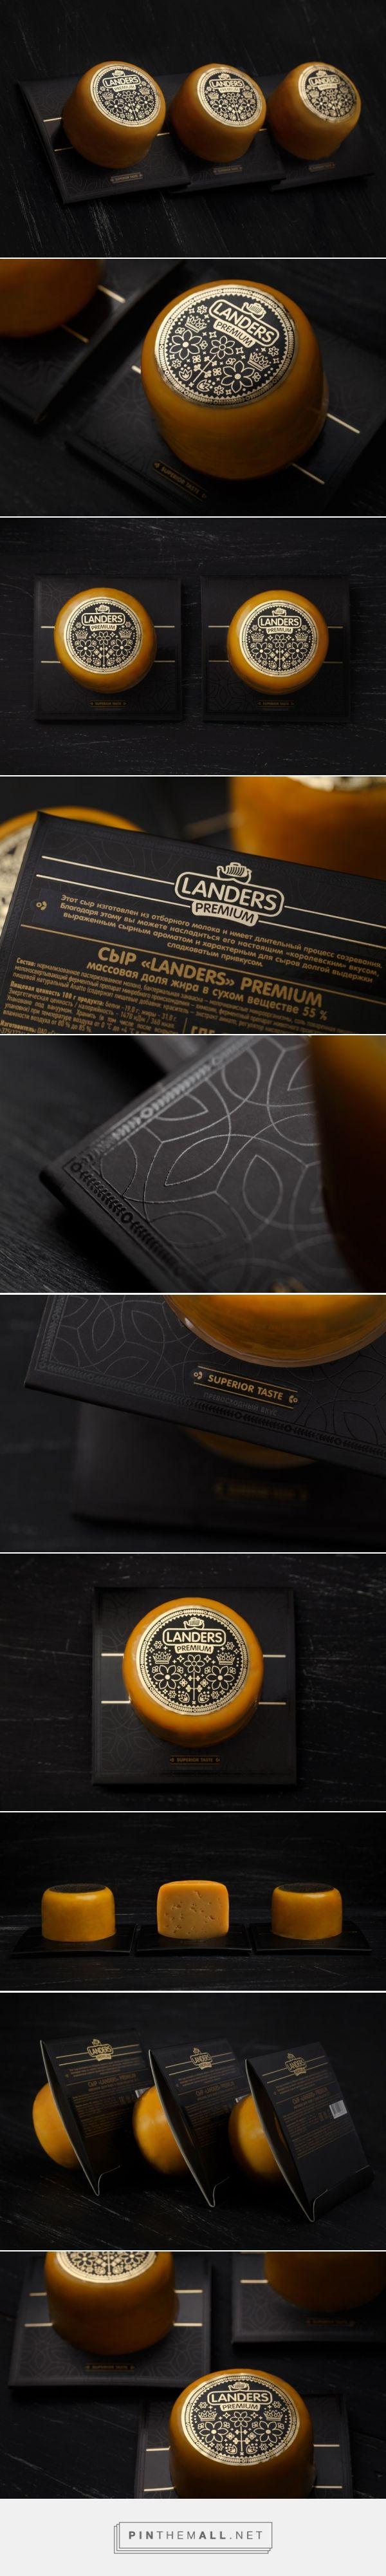 Landers Premium Cheese Packaging by Fabula Branding | Fivestar Branding Agency – Design and Branding Agency & Curated Inspiration Gallery